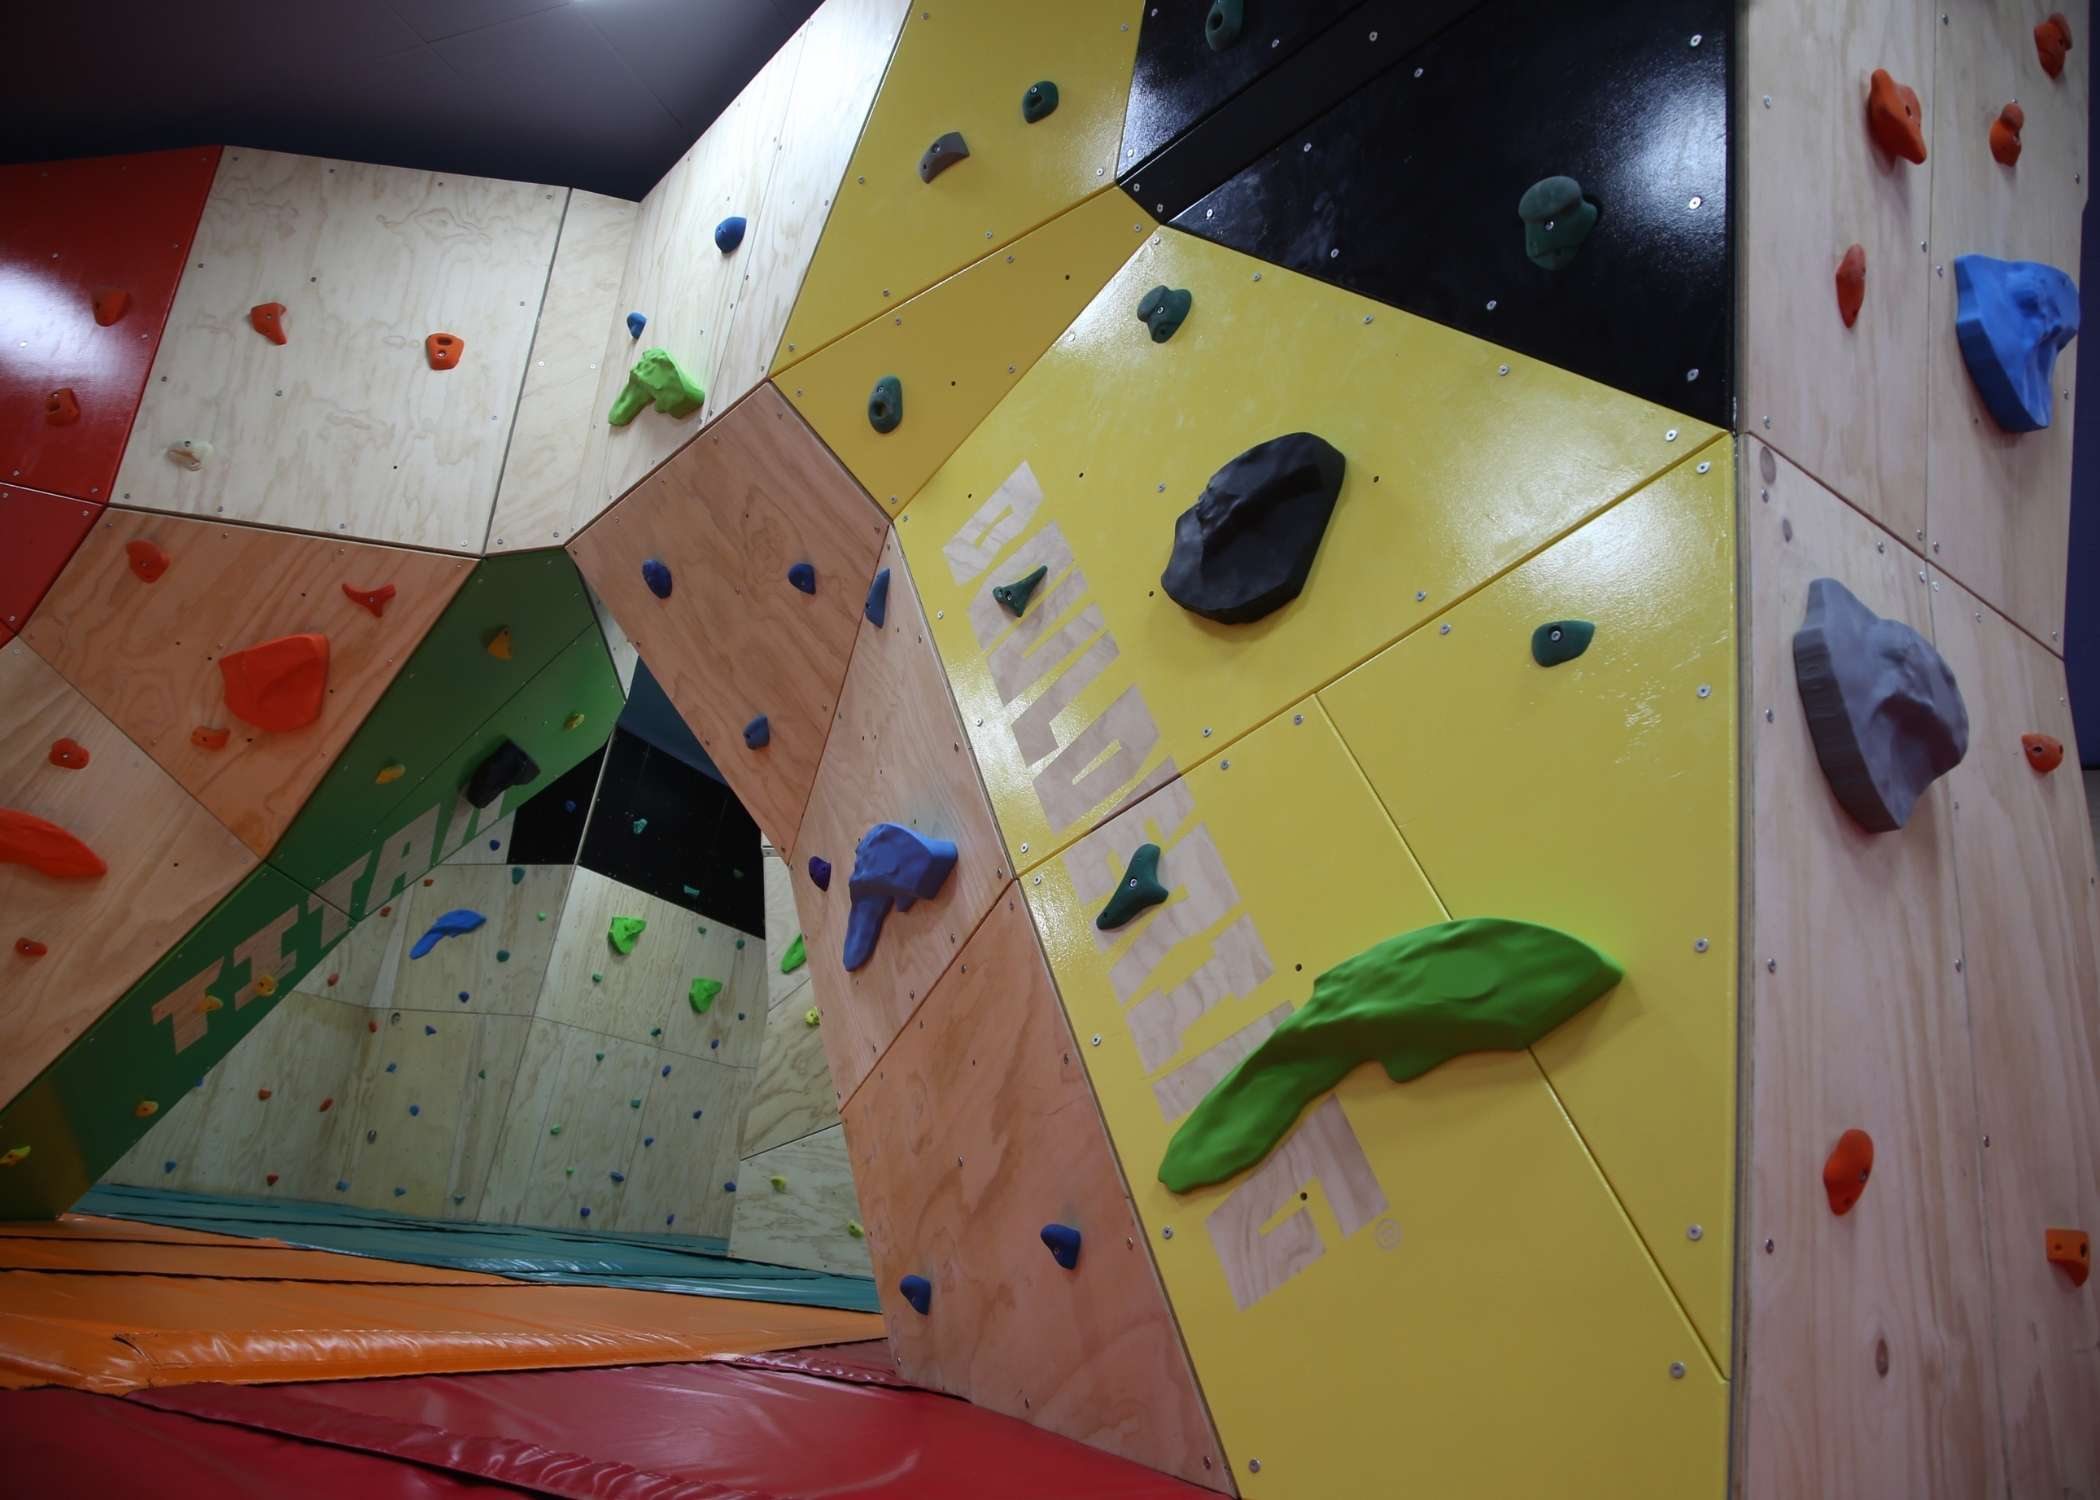 traverse wall installer, bouldering wall supplier